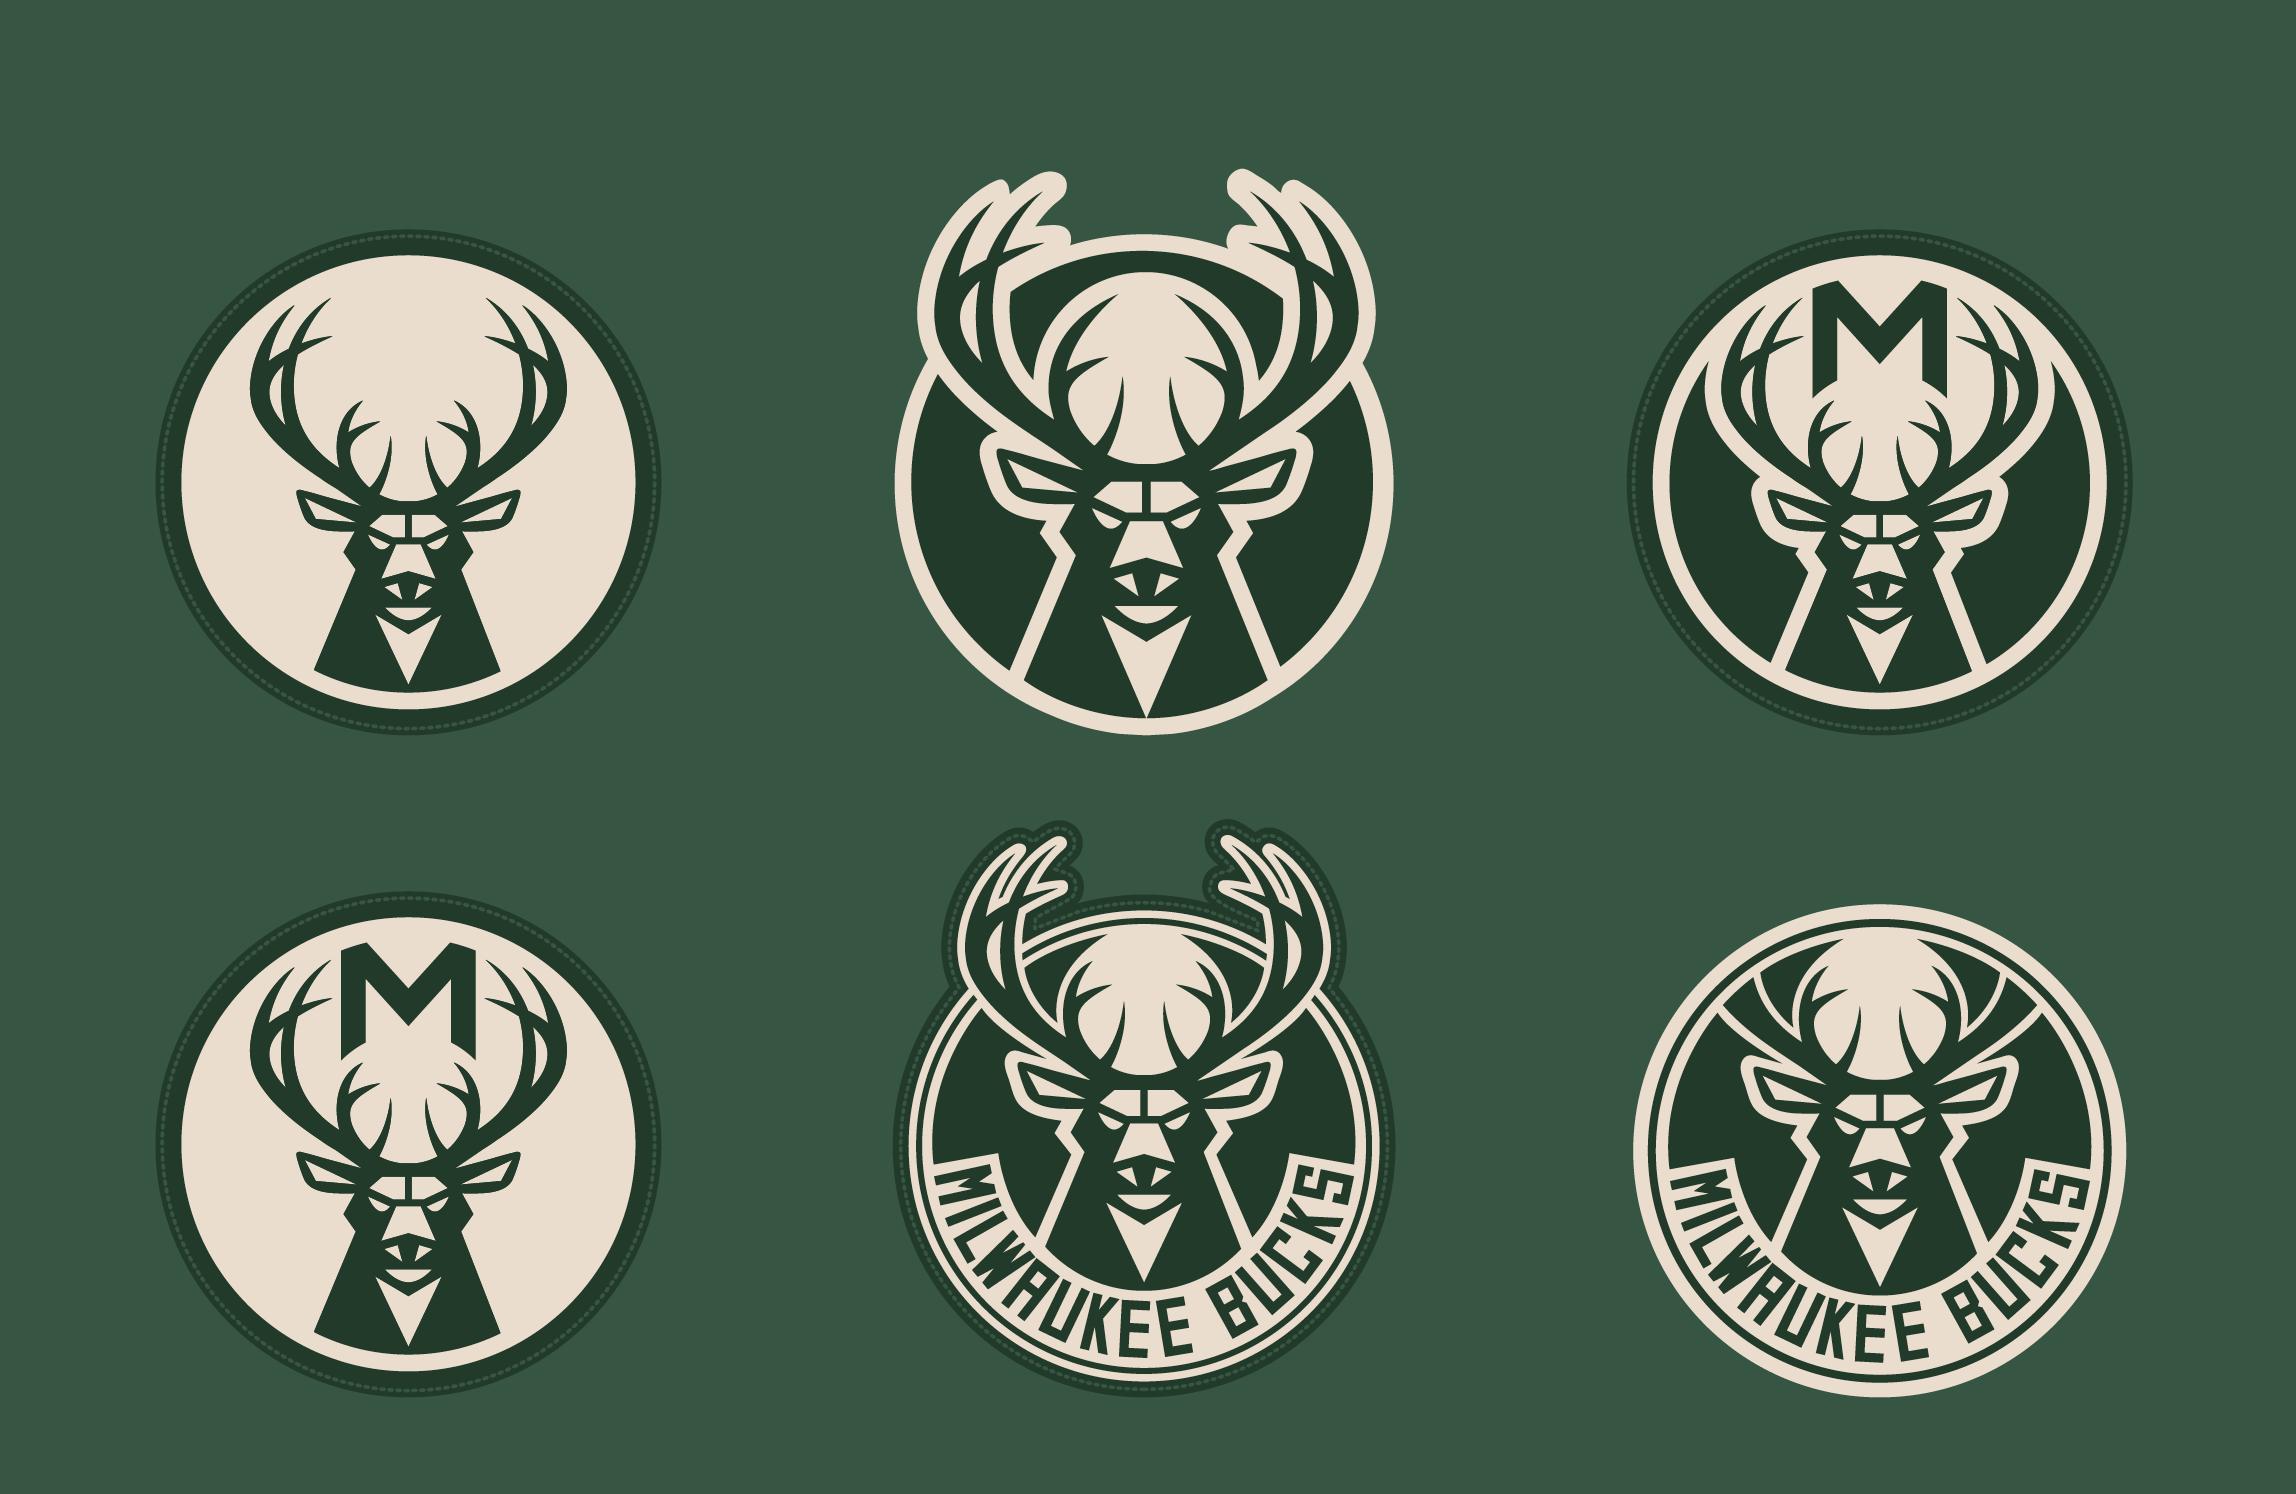 Buck clipart nba Redesign Inside Bucks' logo like